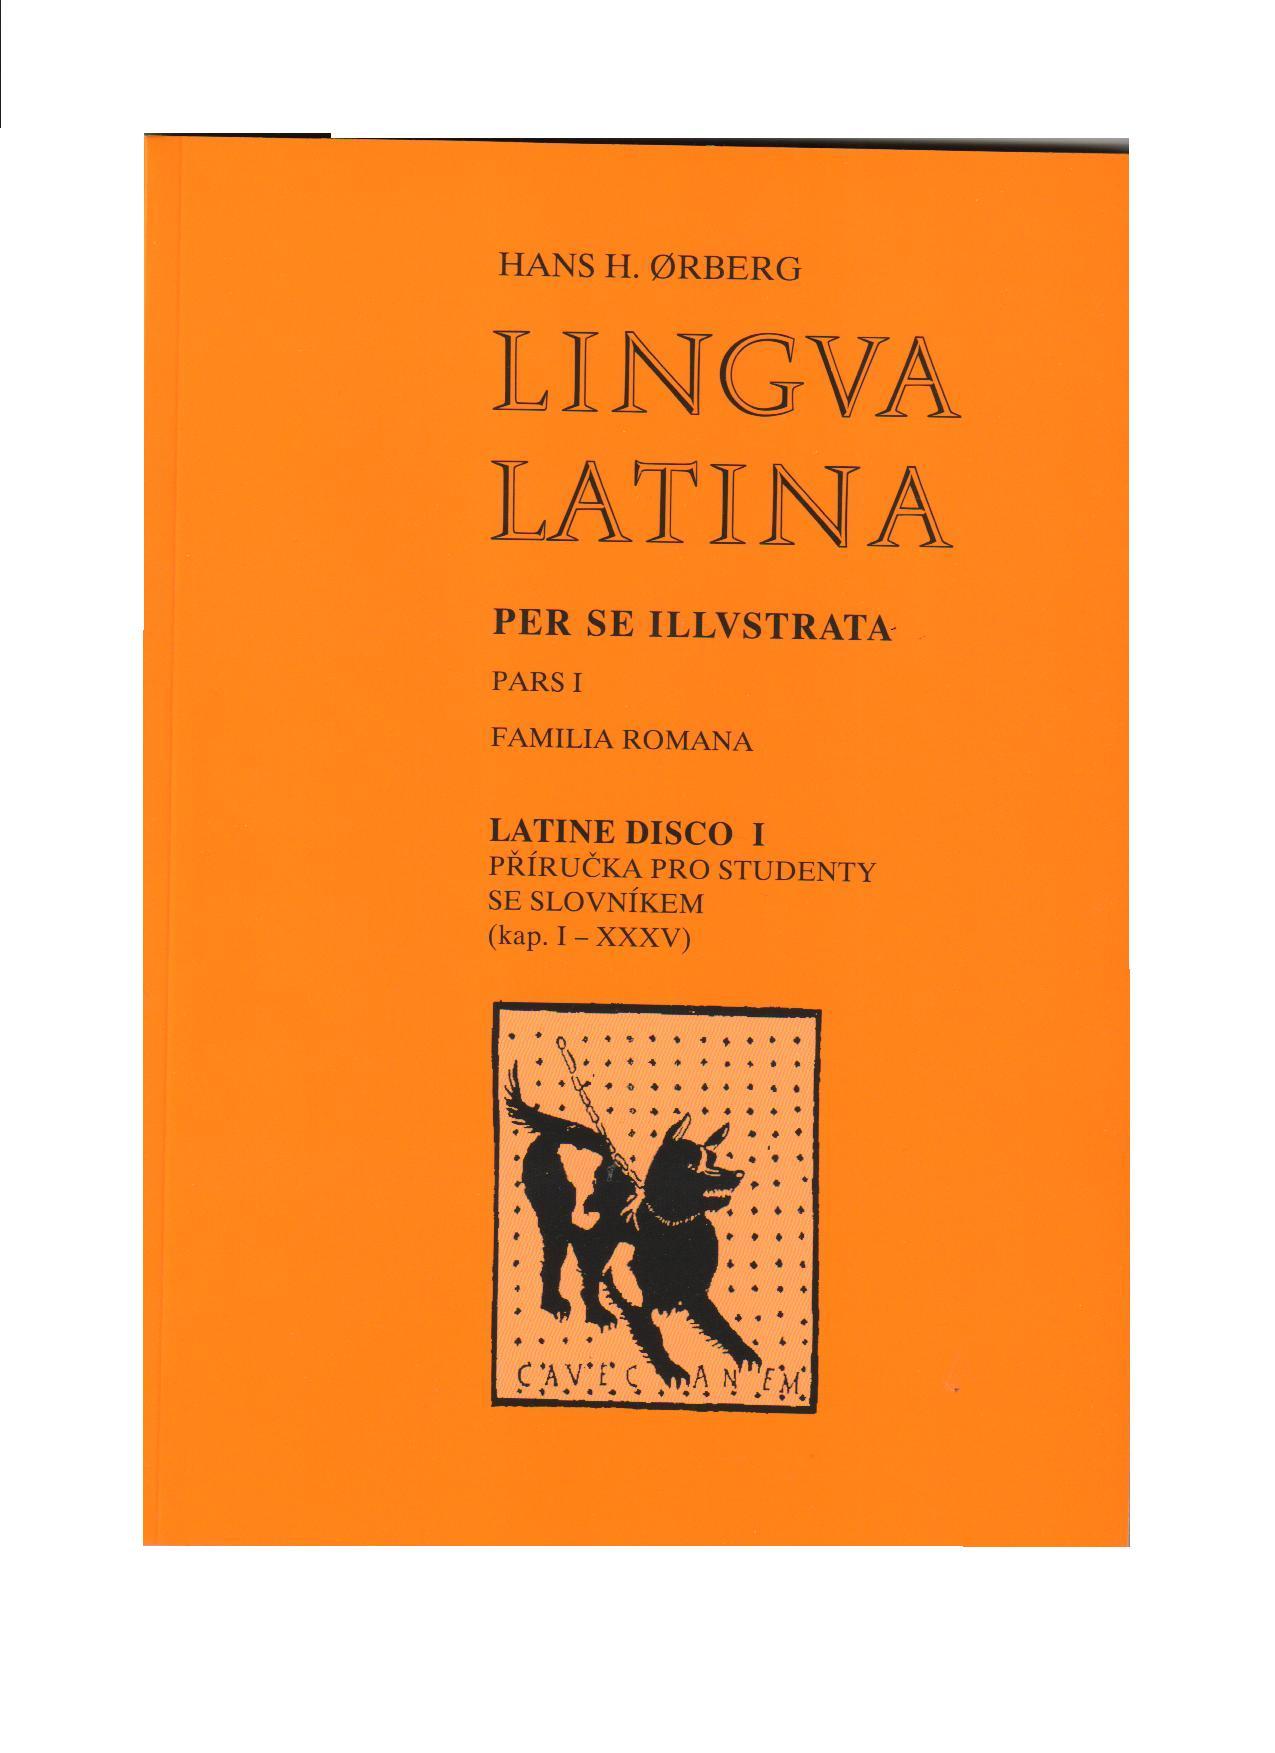 Fotografie Latine disco I. - se slovníkem